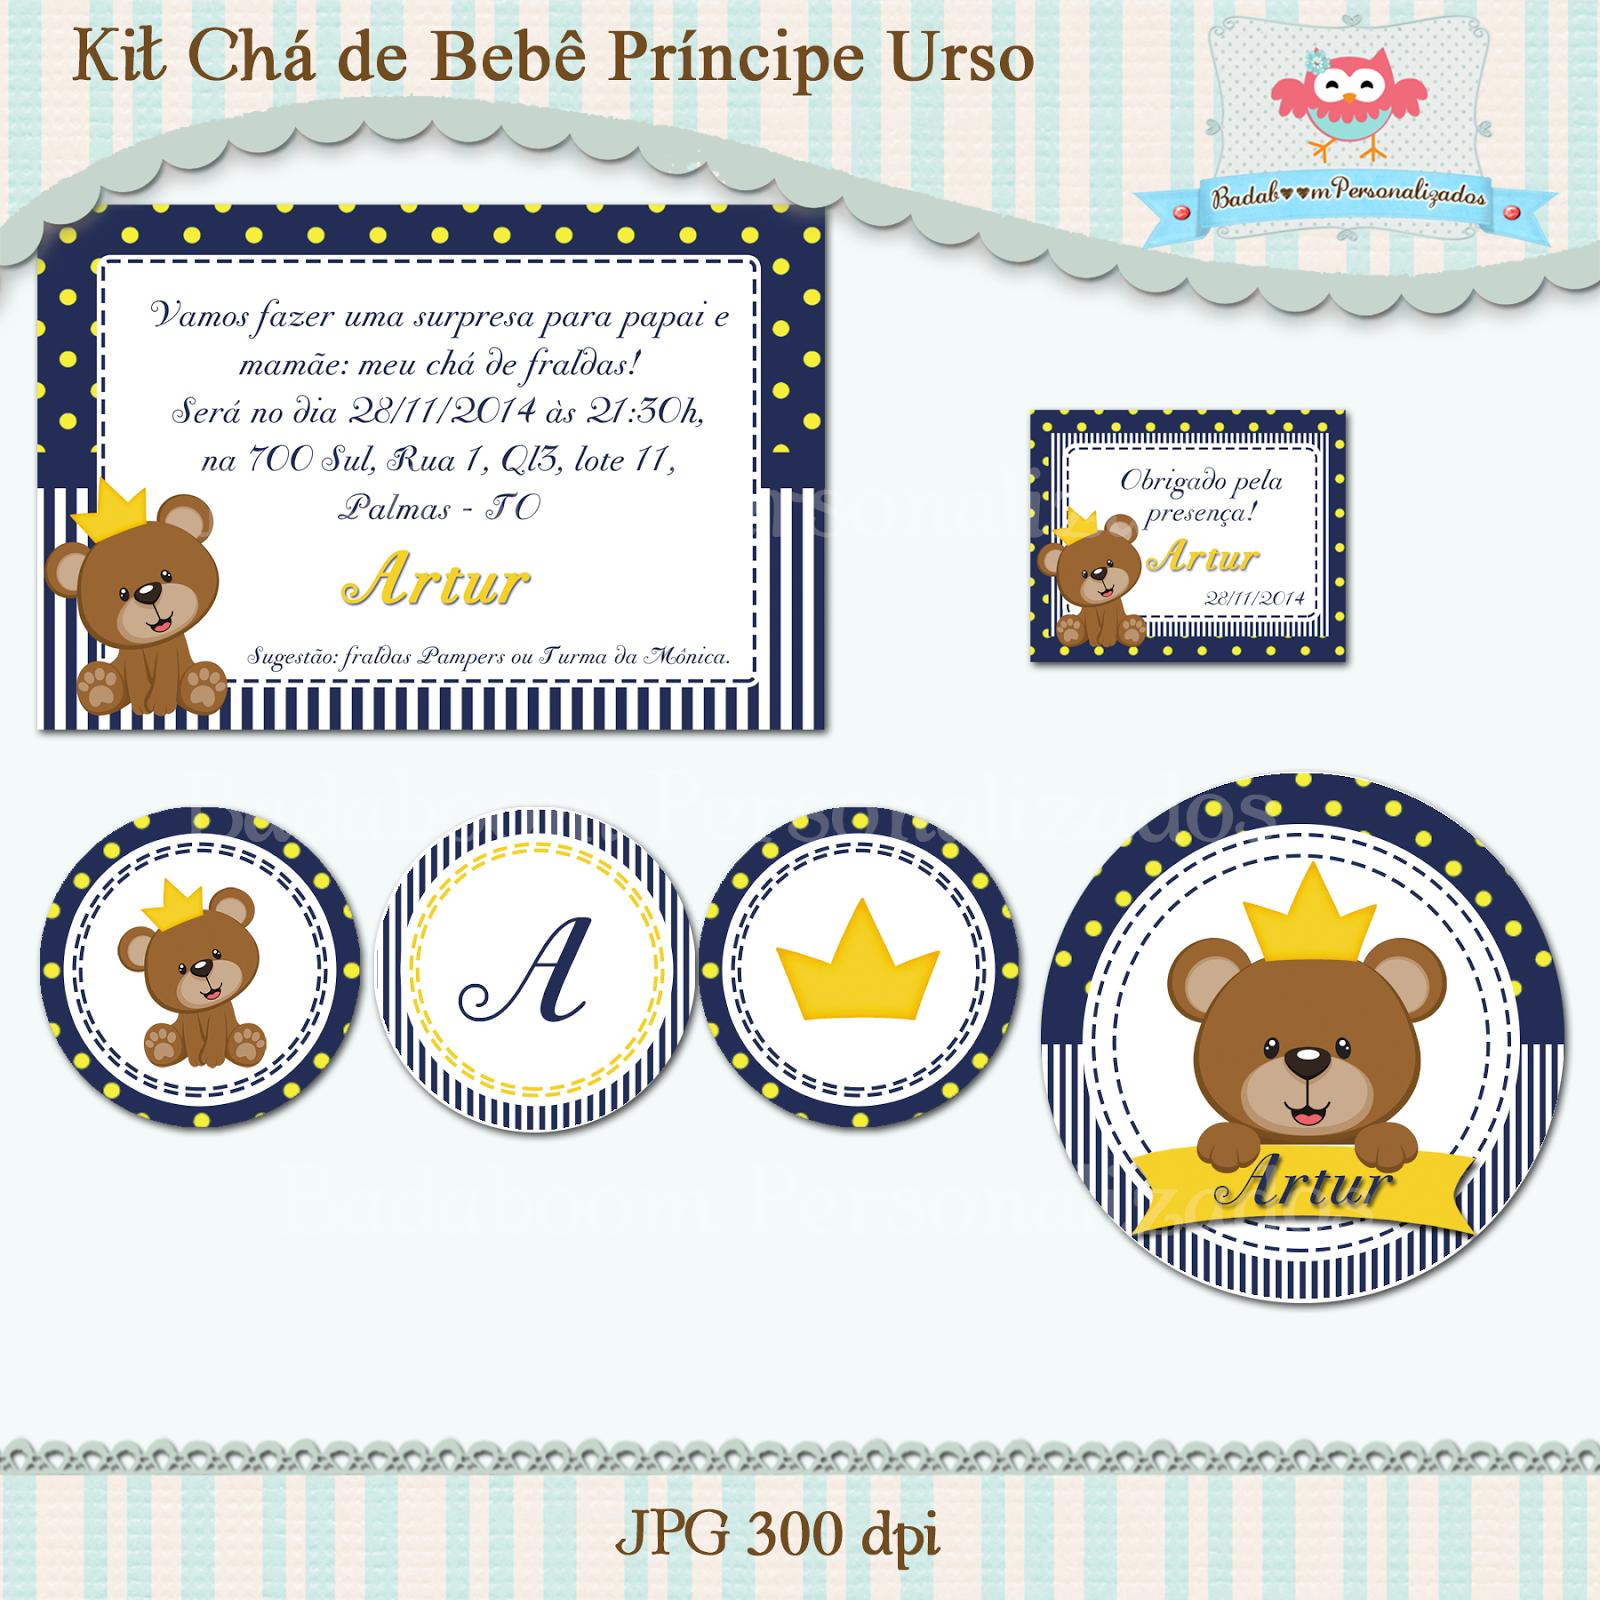 Chá de bebê, Festa Infantil, Kit Festa, Urso, Arte digital, Kit digital, convite, topper, totem, min to be, latinha, tag